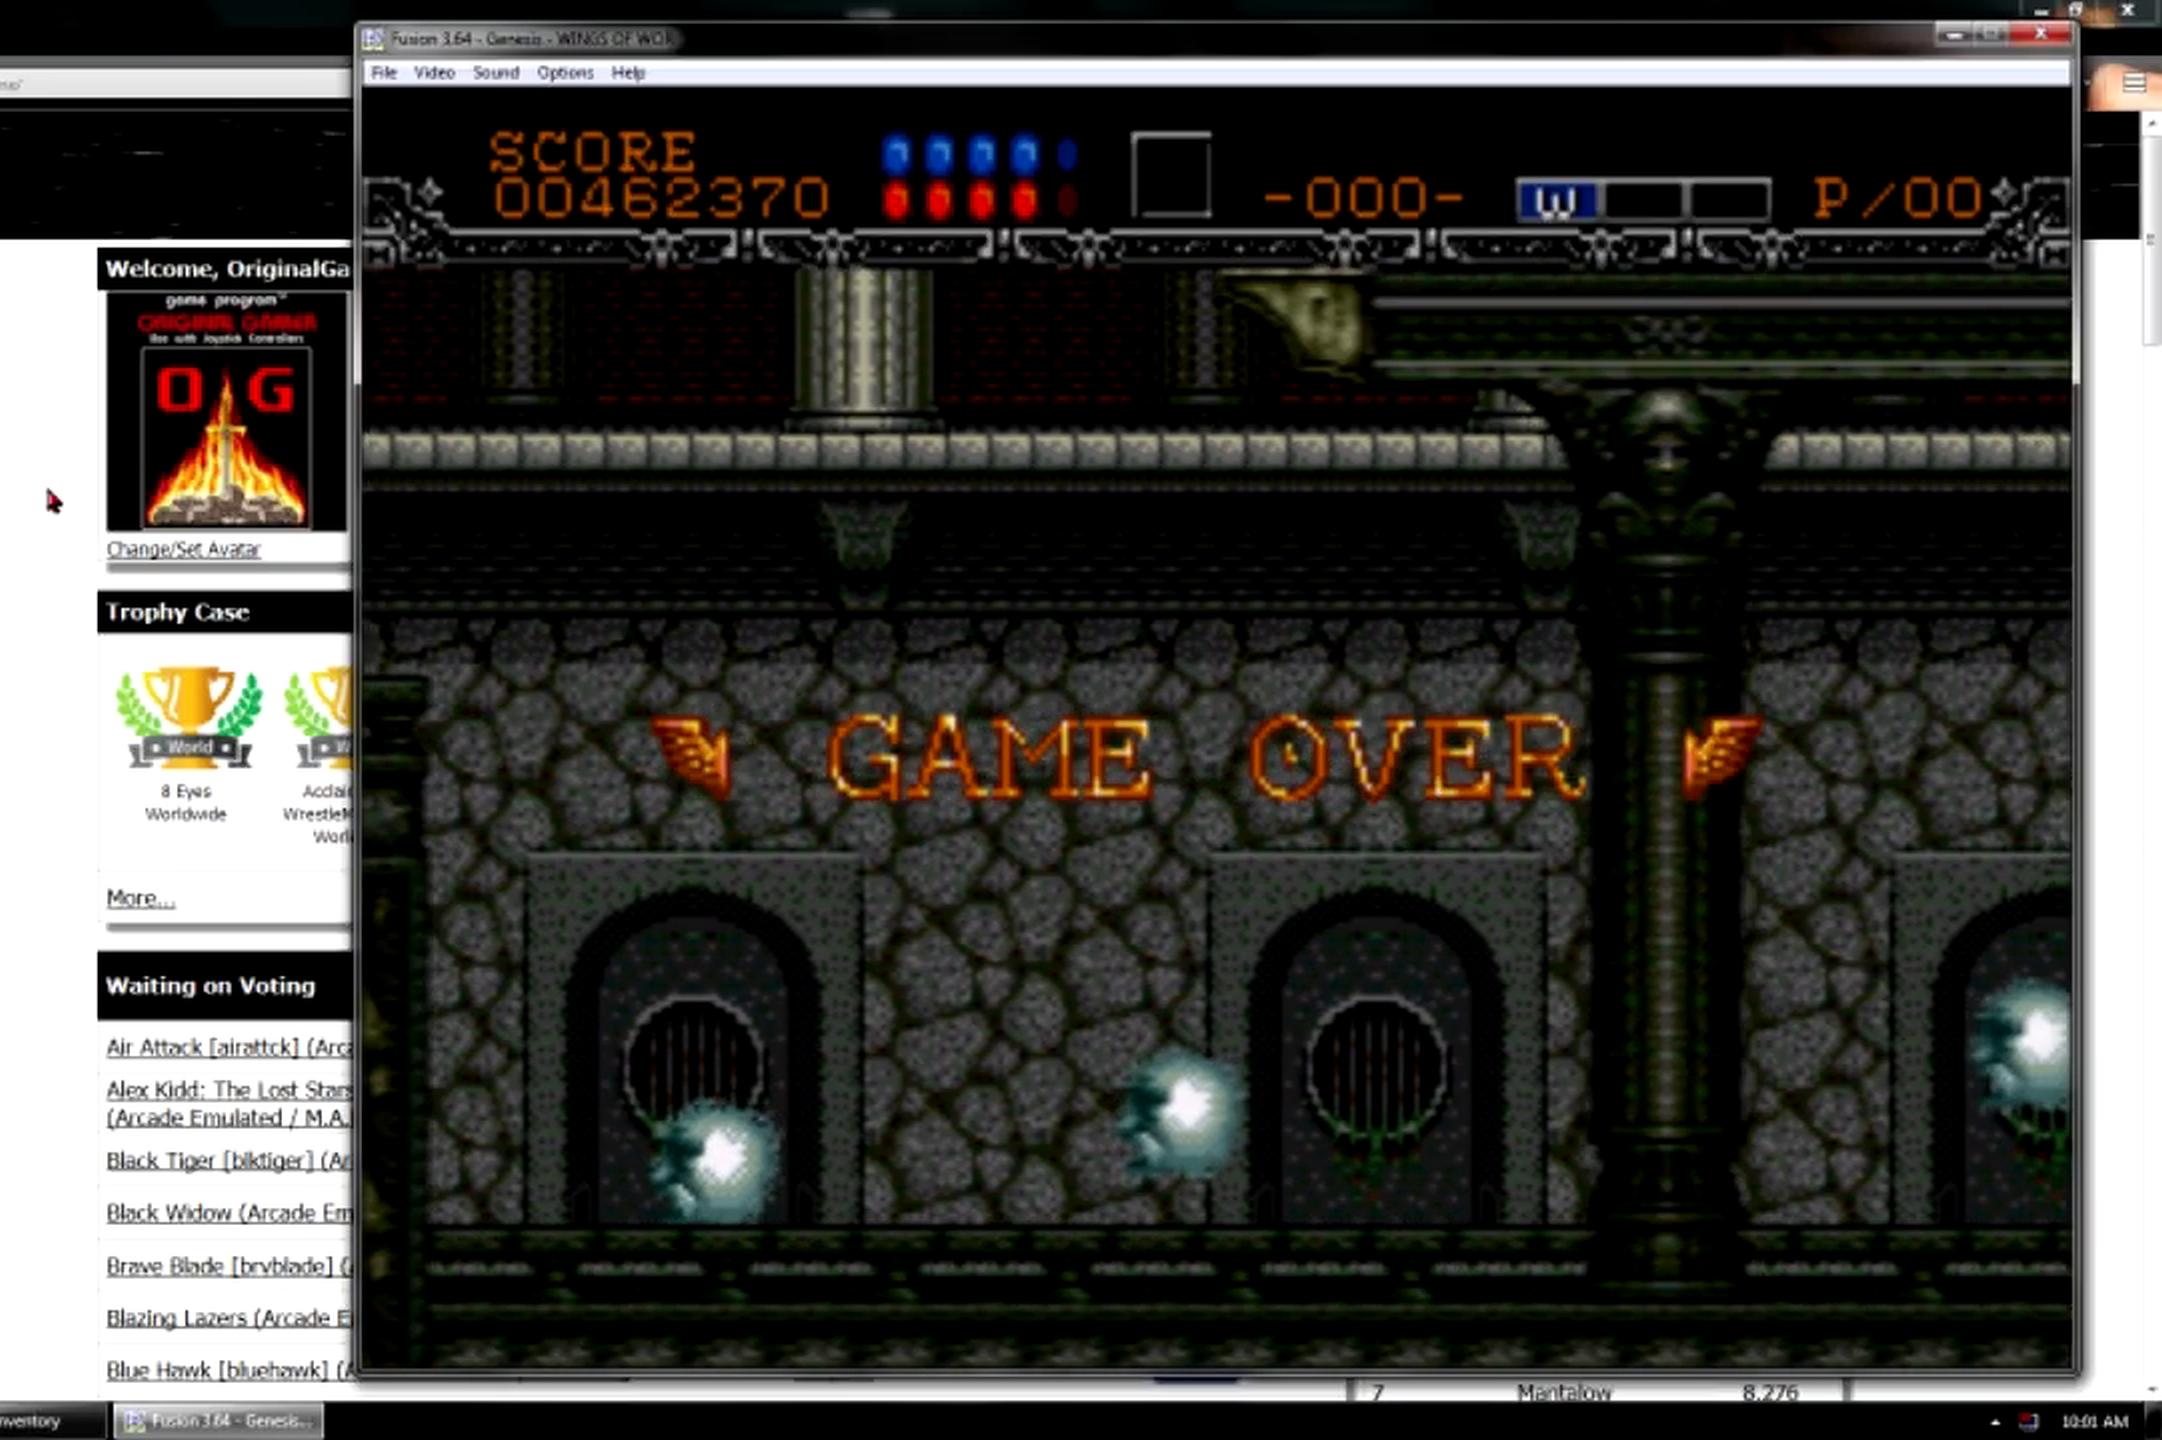 OriginalGamer: Wings of Wor / Gynoug: Easy (Sega Genesis / MegaDrive Emulated) 462,370 points on 2015-06-08 23:53:34